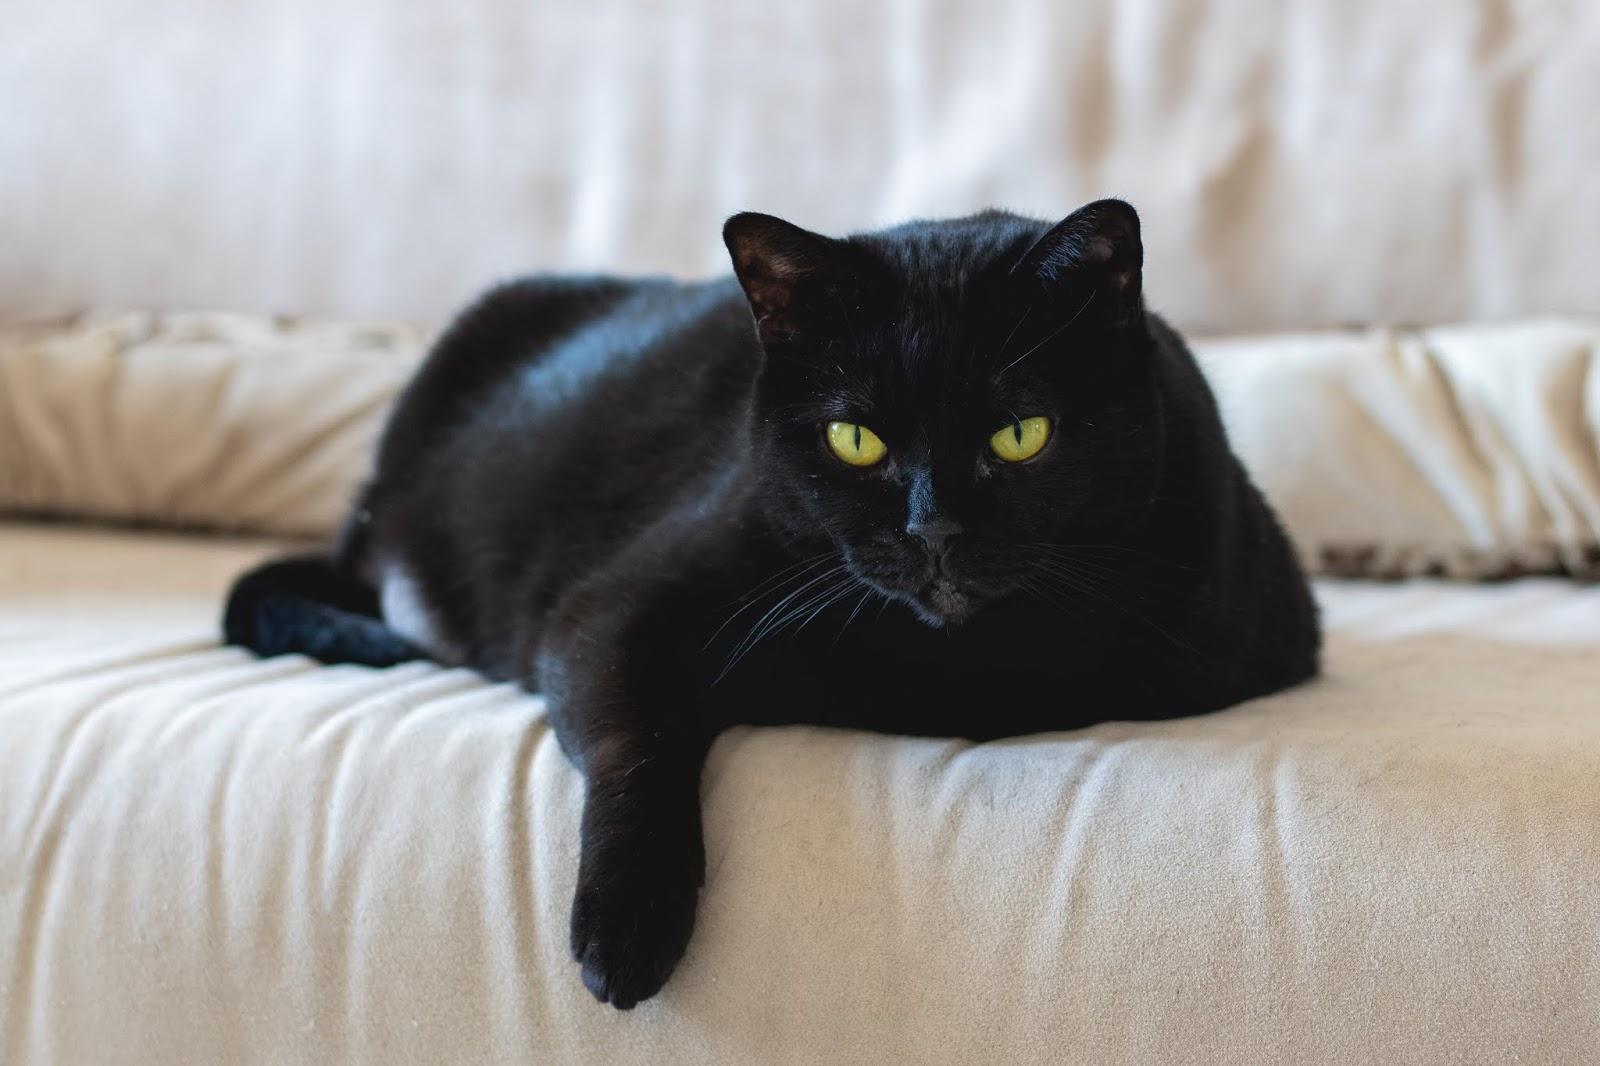 black cat on white textile,cat images